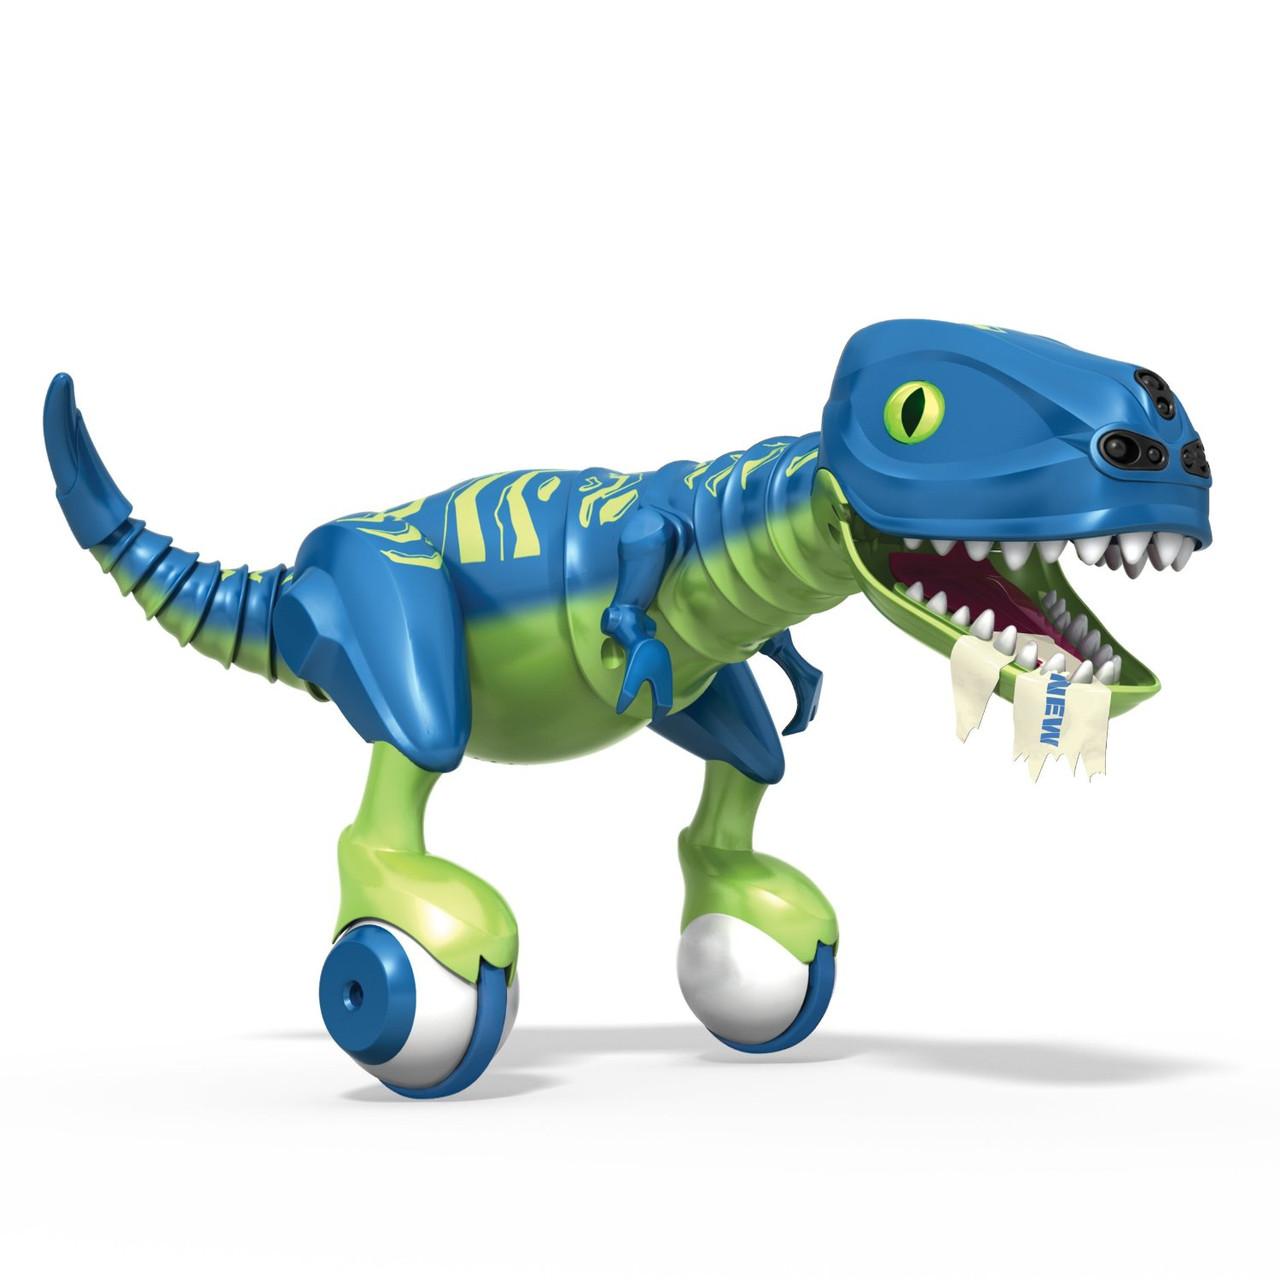 Dino Zoomer Эволюция - Интерактивный робот-динозавр